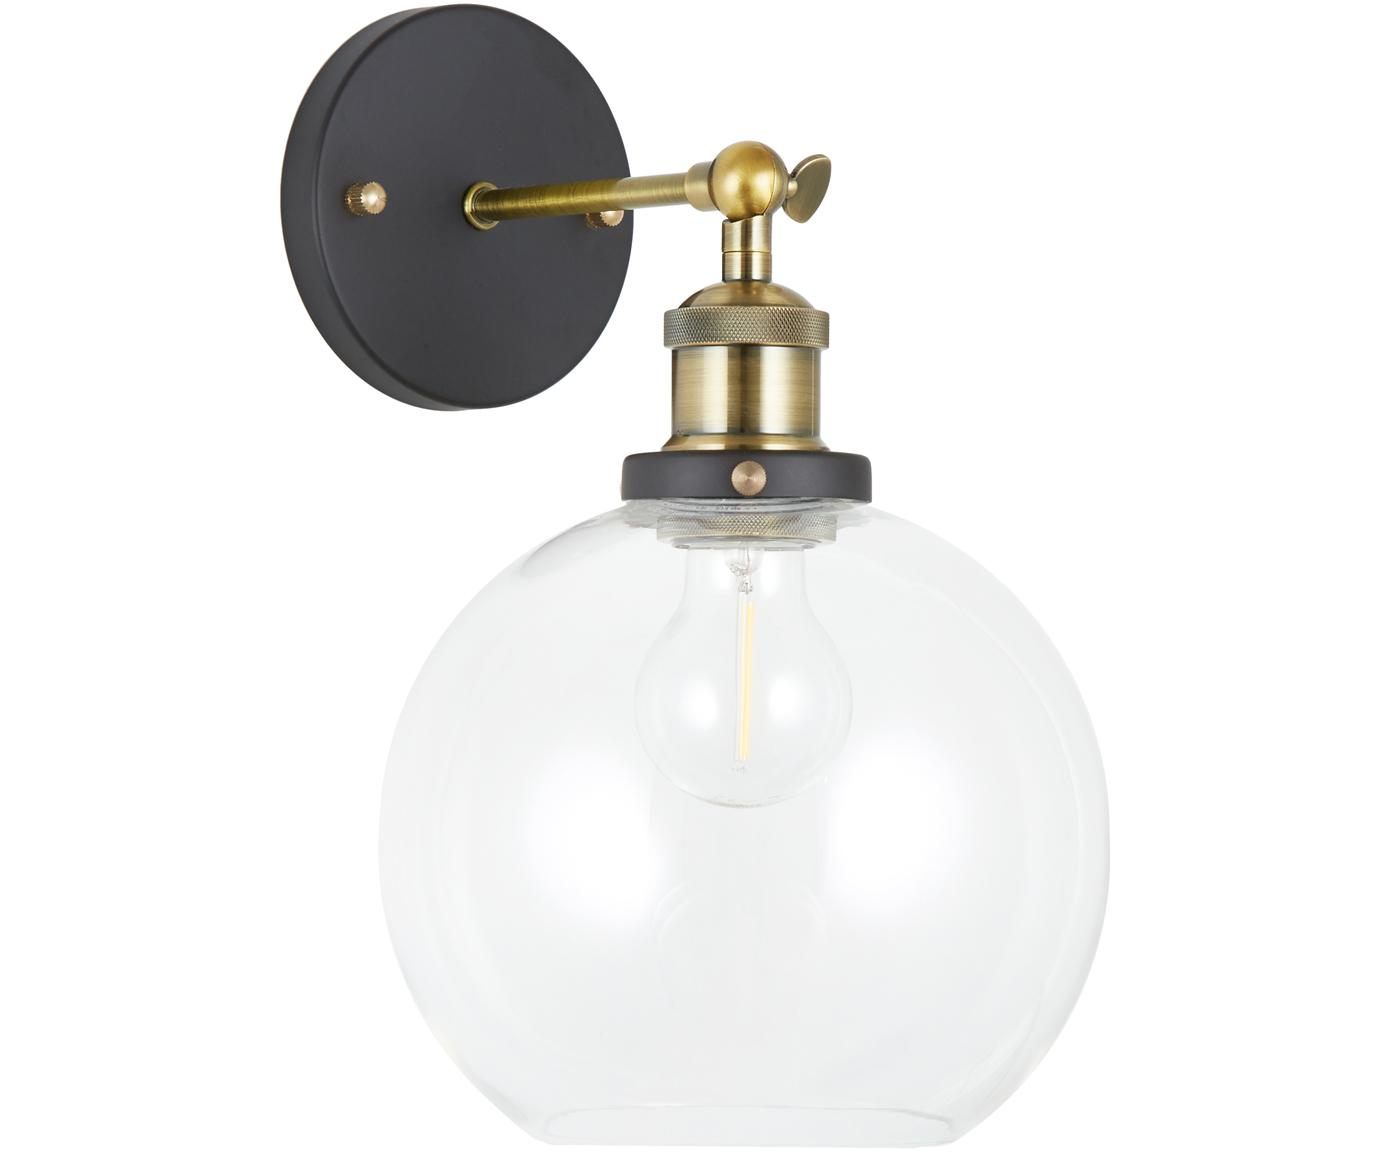 Wandleuchte New York Loft No.2, Baldachin: Metall, pulverbeschichtet, Lampenschirm: Glas, Schwarz, Messing, Transparent, 20 x 30 cm